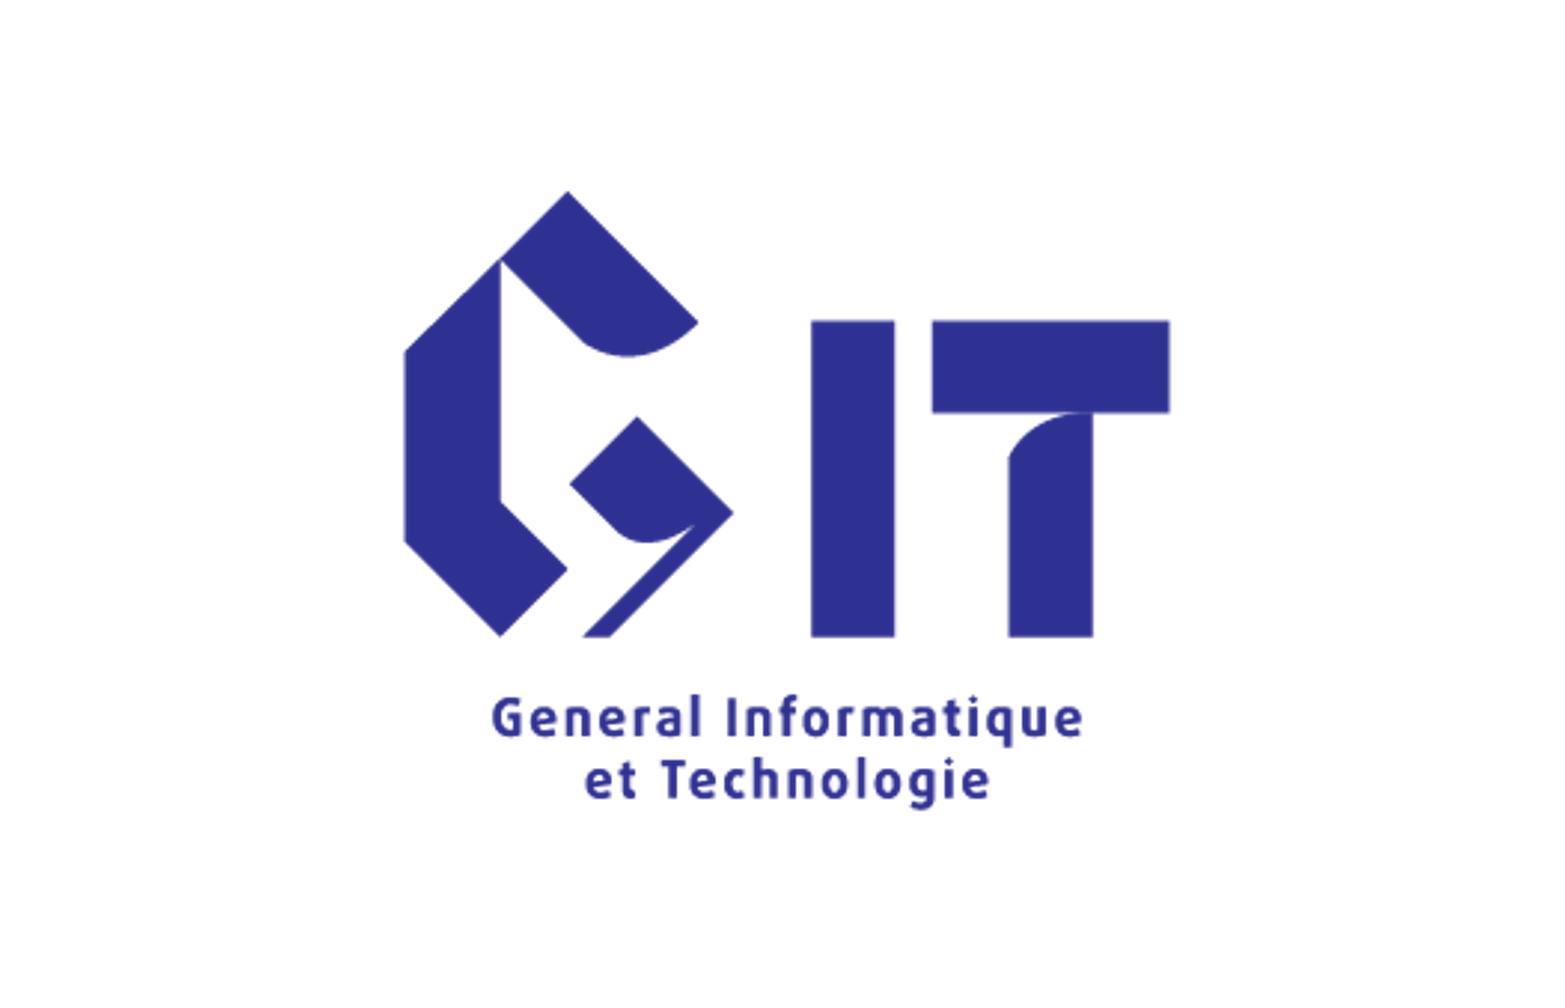 GENERAL INFORMATIQUE ET TECHNOLOGIE